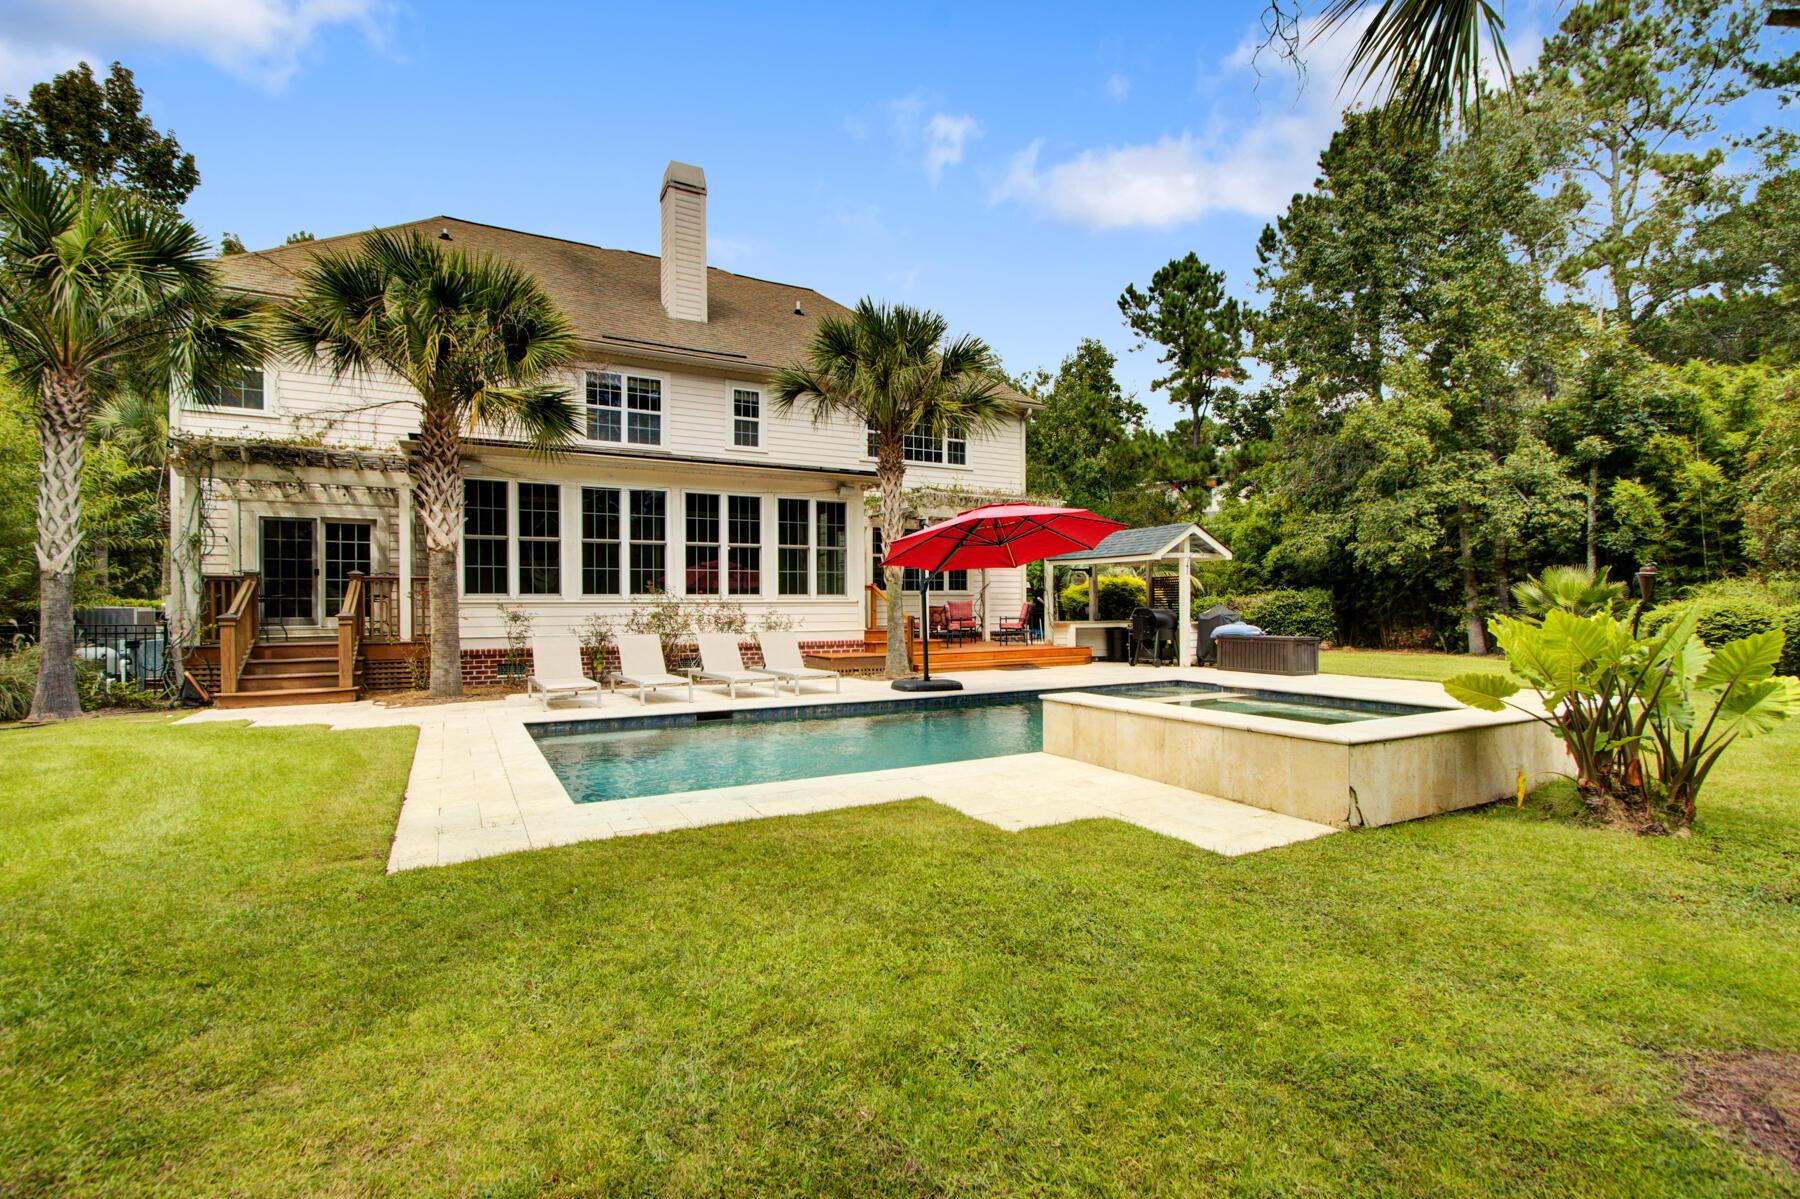 Dunes West Homes For Sale - 3095 Pignatelli, Mount Pleasant, SC - 45